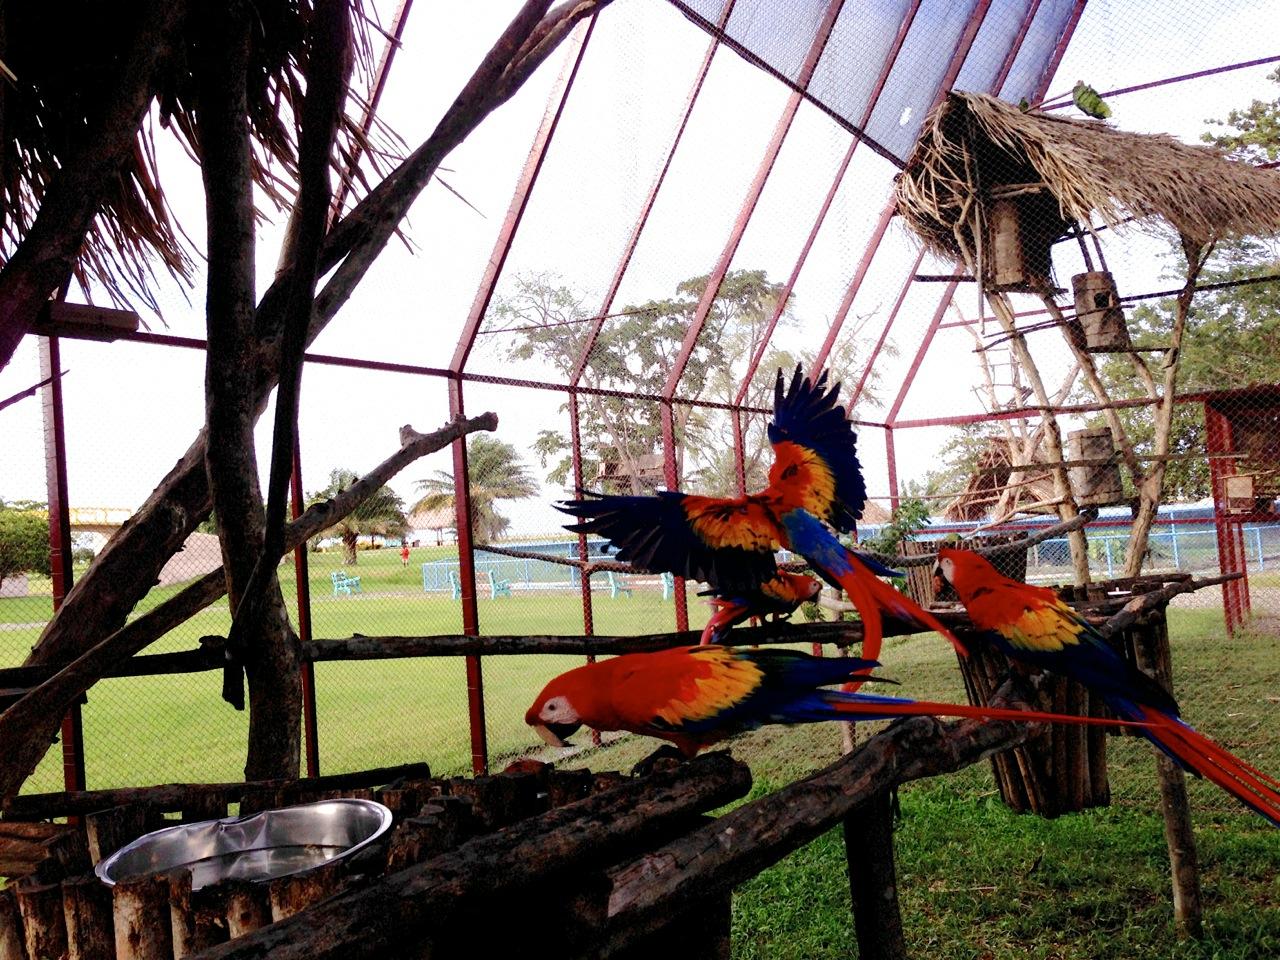 Scarlet Macaw Project in Honduras